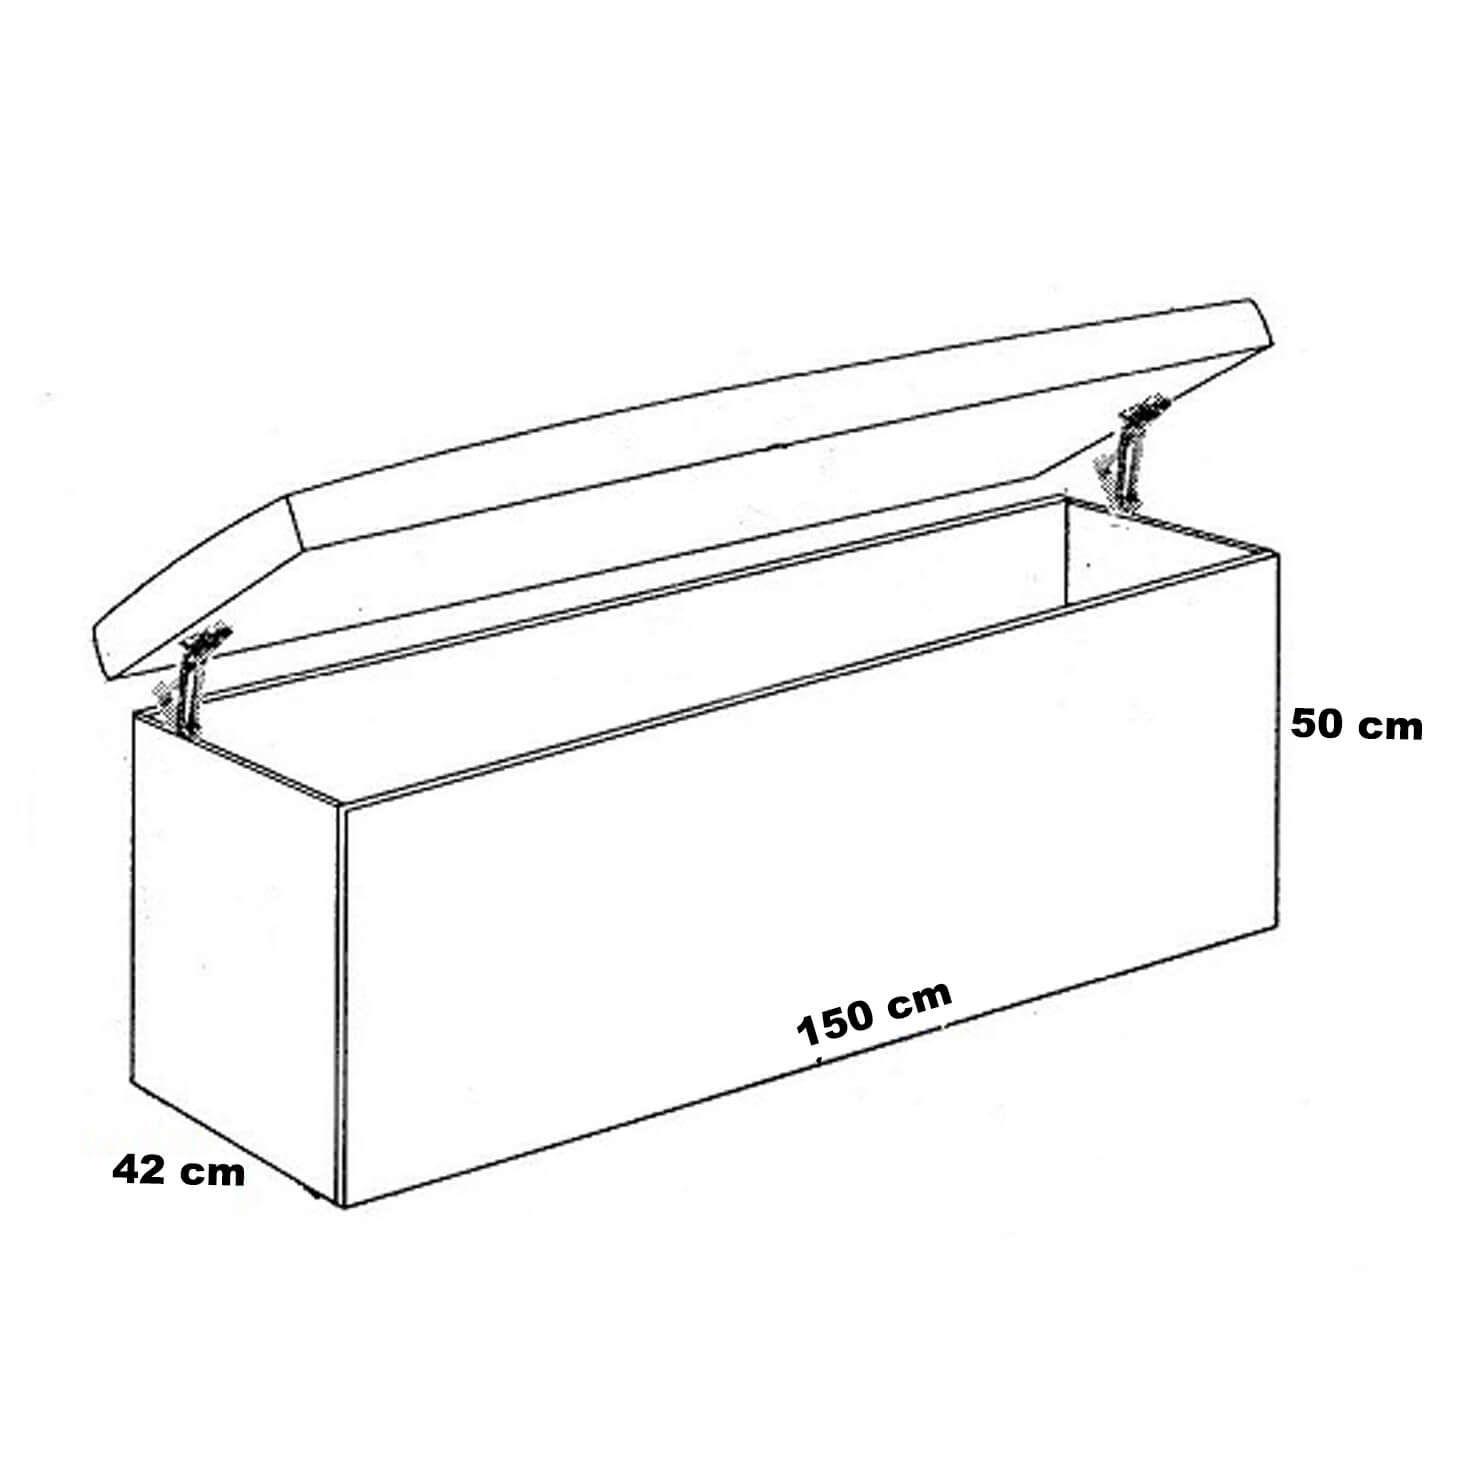 Cabeceira Box Queen com Recamier Siena 1.6 Suede Cinza - R.A Estofados